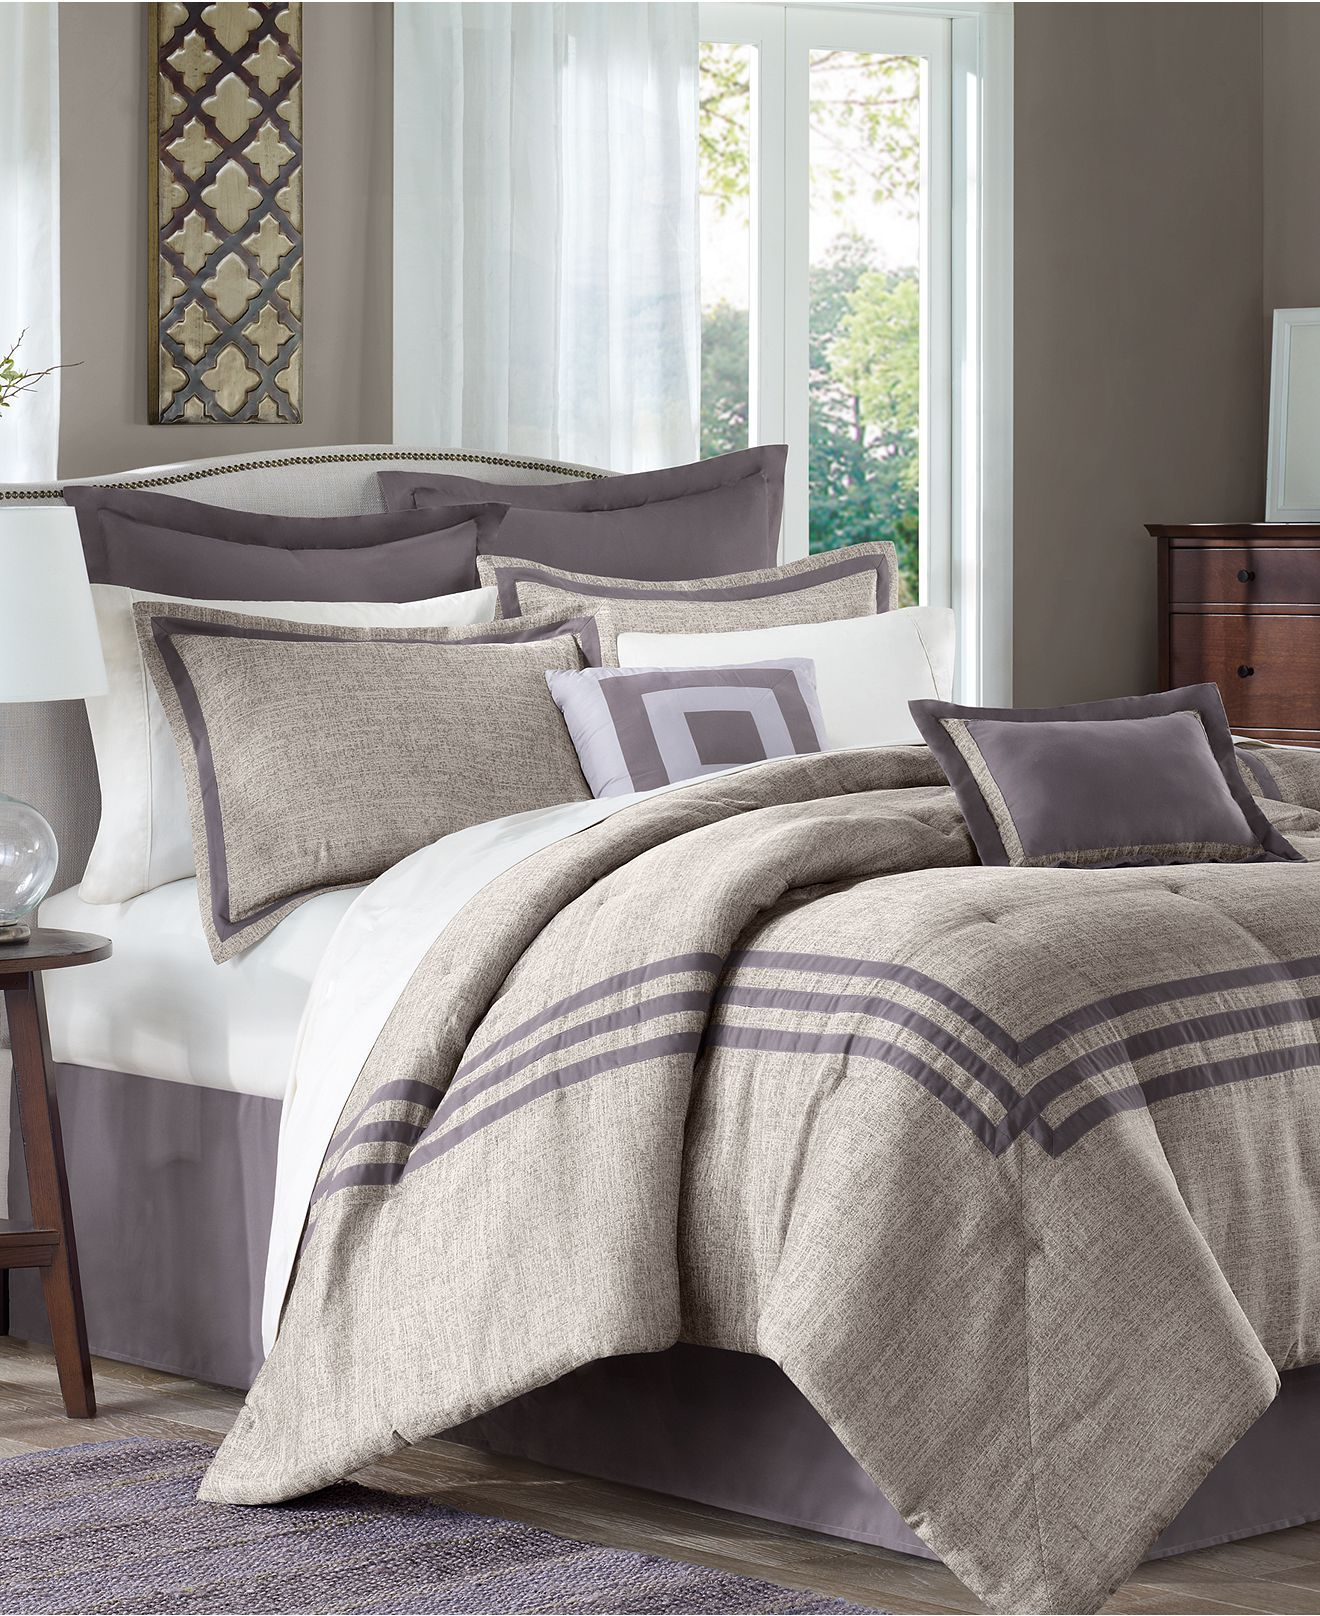 Affinia 8 Piece Jacquard Comforter Sets - Bed in a Bag ...